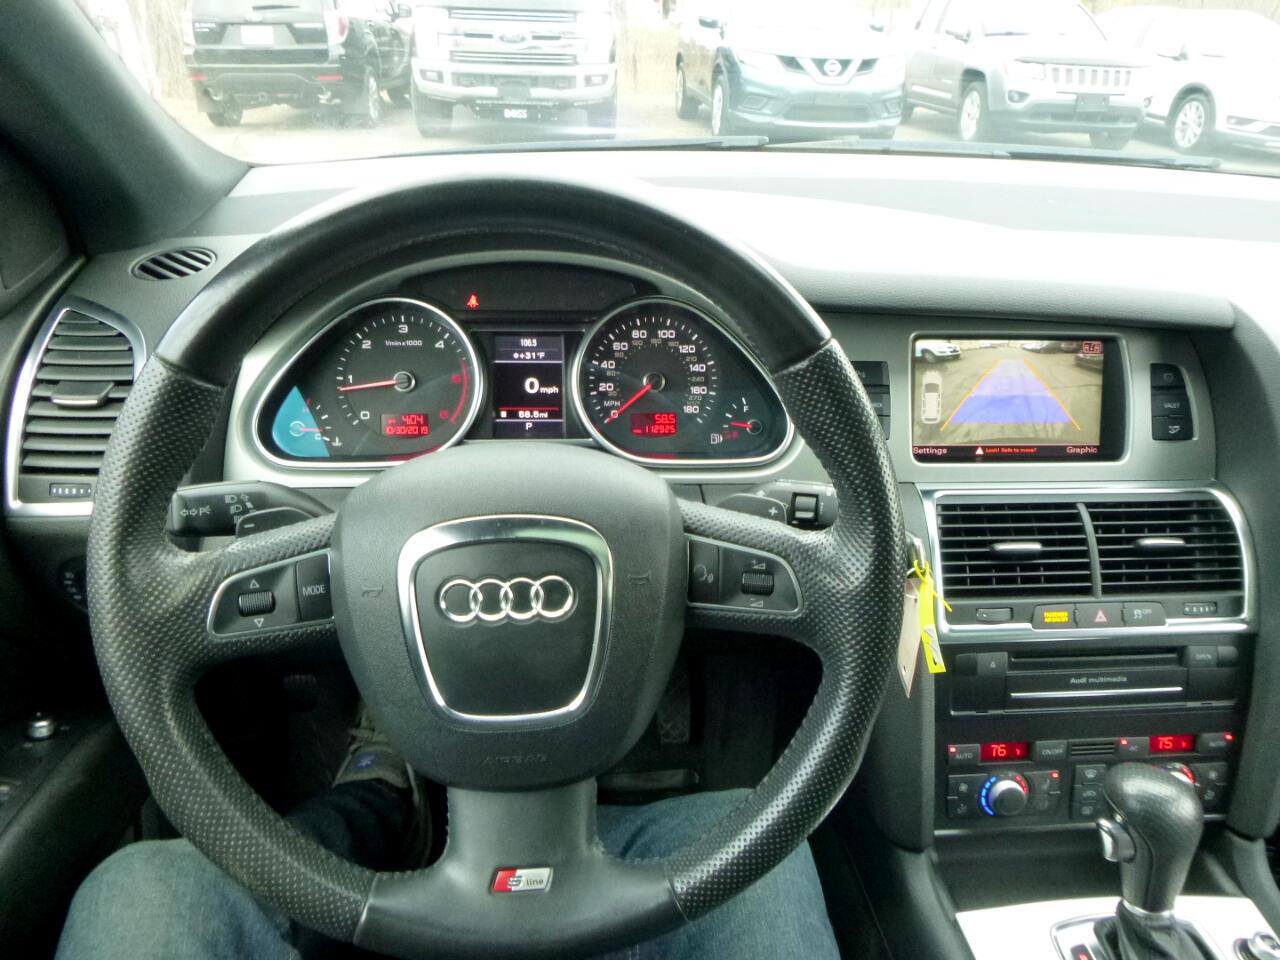 2011 Audi Q7 TDI quattro Prestige S-Line